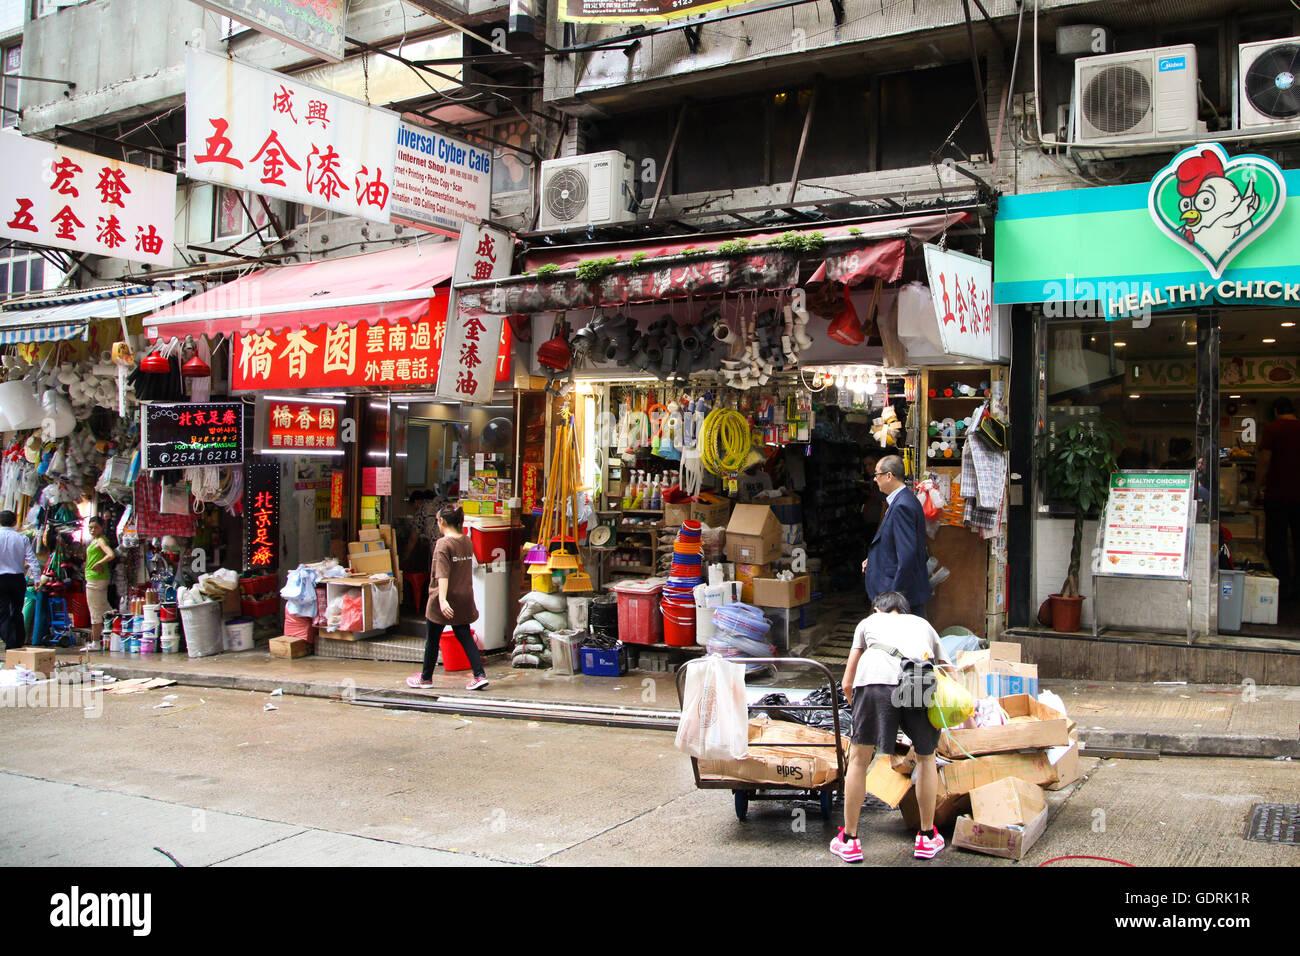 Hong Kong street market in Kowloon. - Stock Image